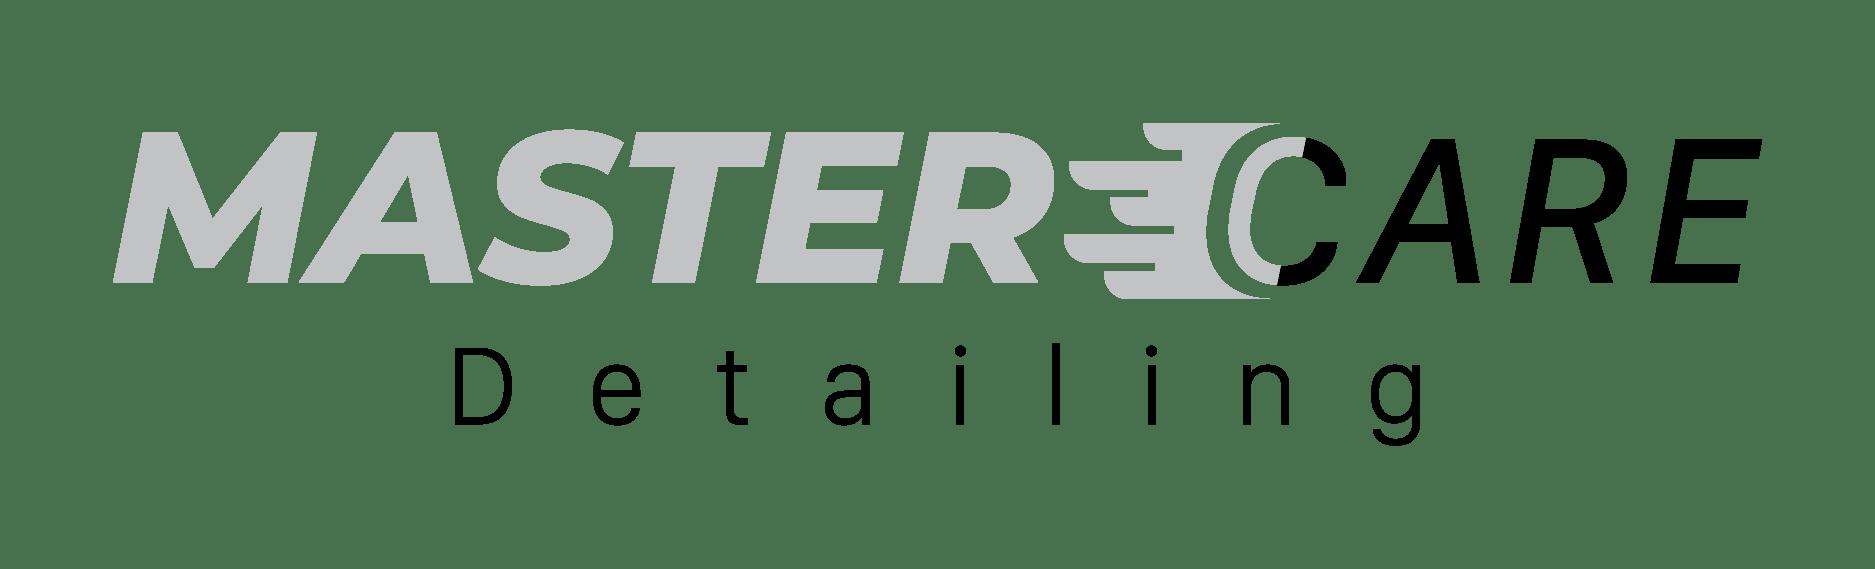 Master Care logo final cs5 1 01